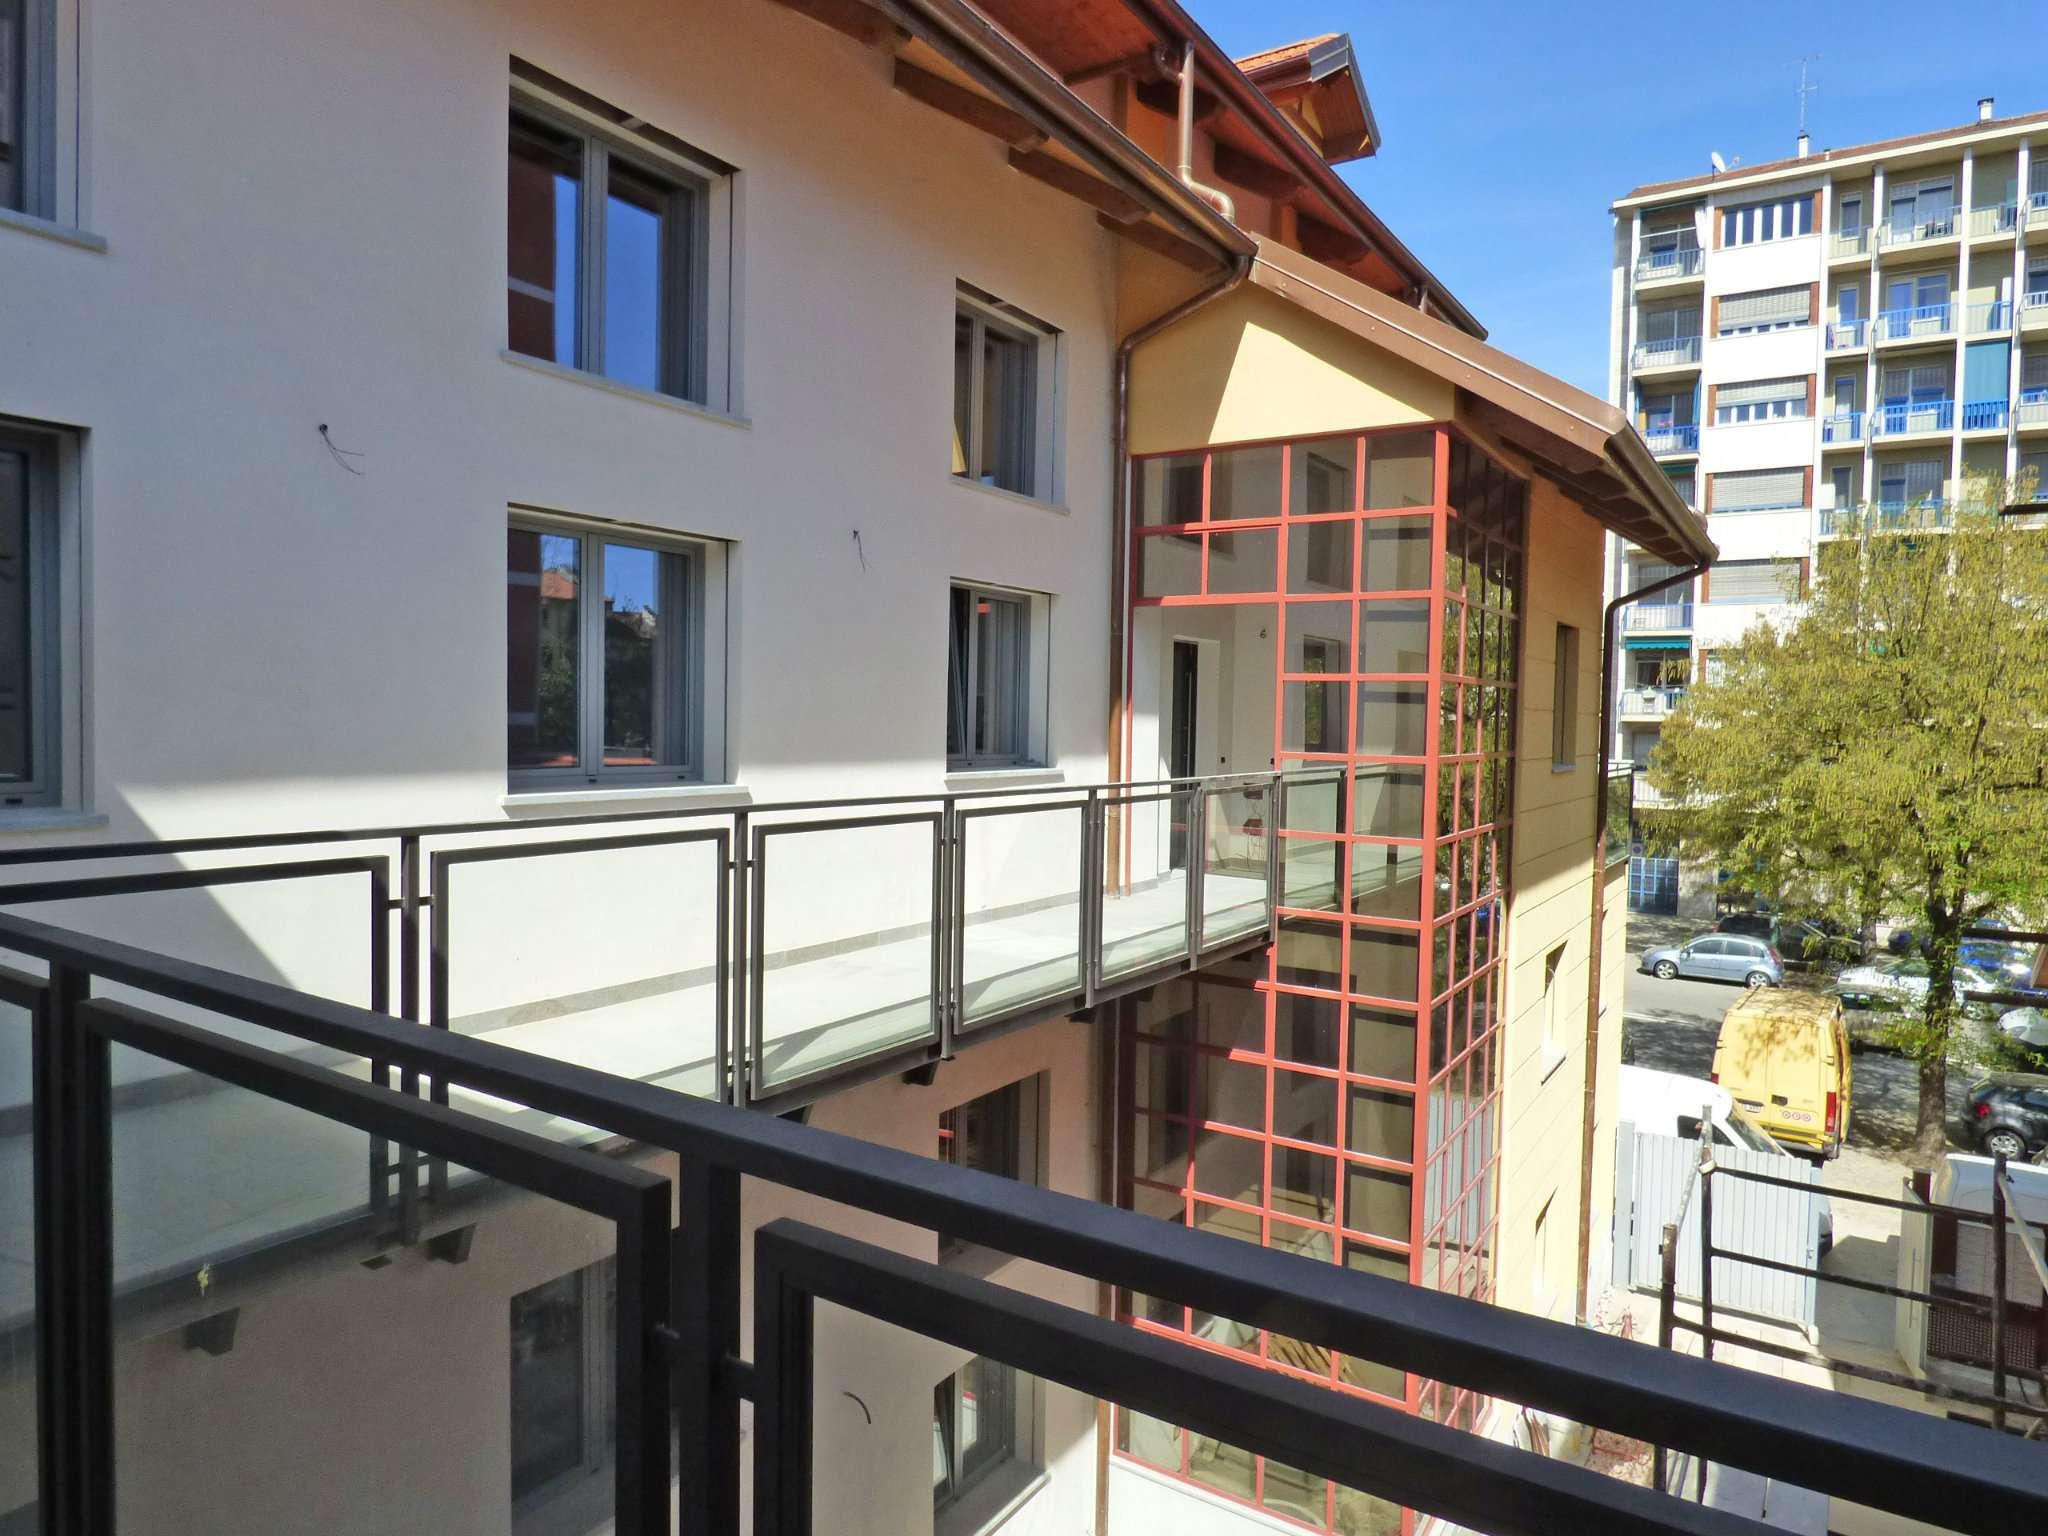 Bilocale Torino Corso Verona 3